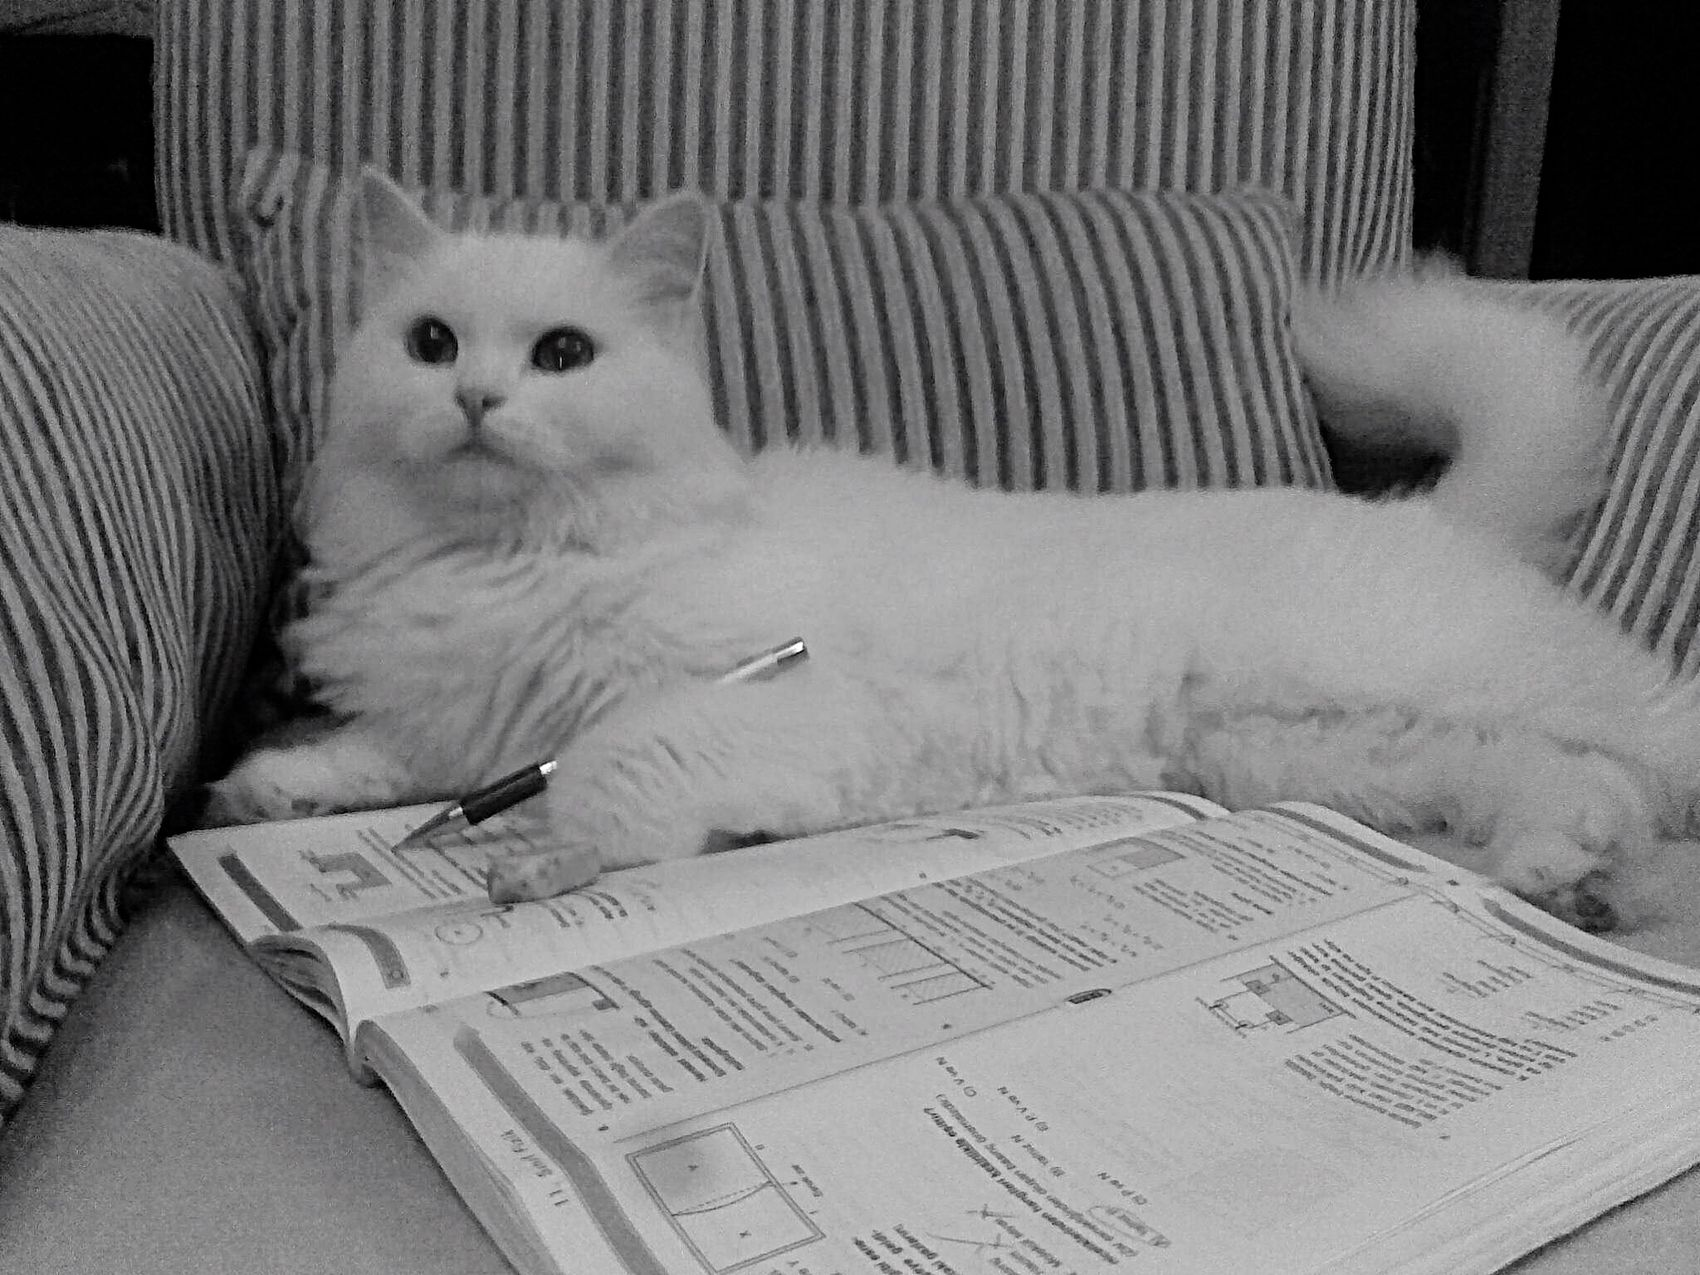 White Cat Studying Intelligent Cat